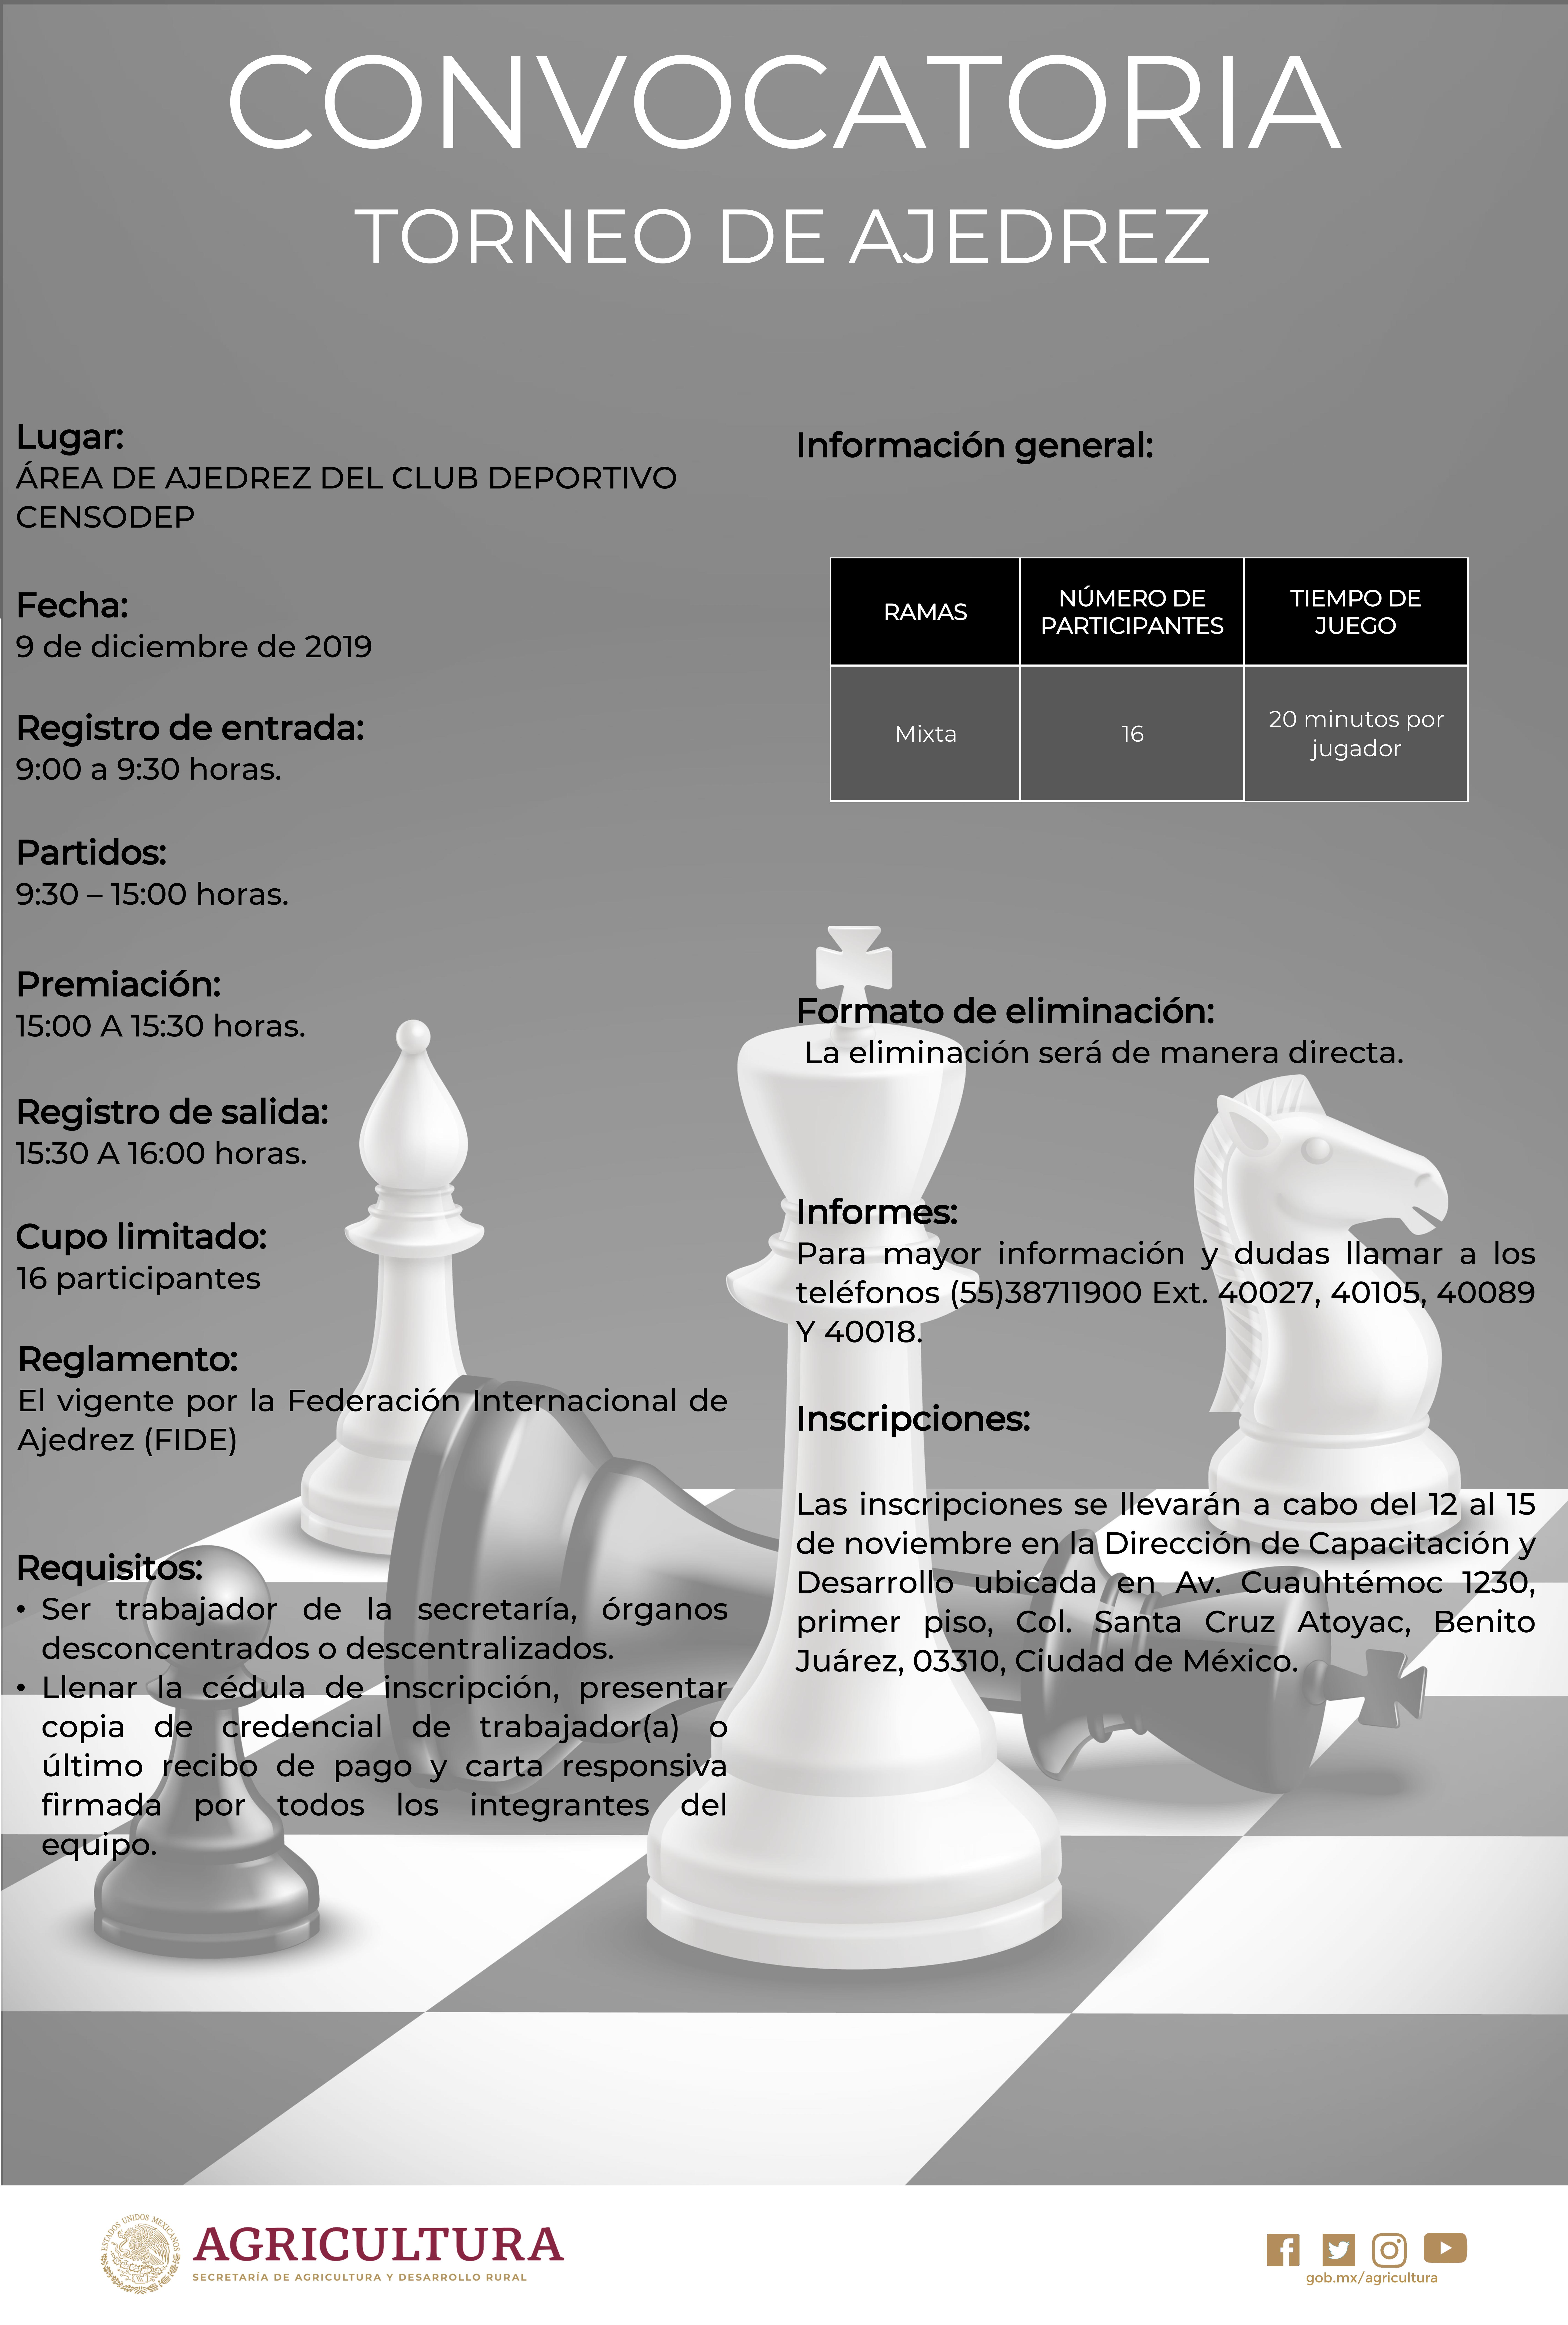 Convocatoria Torneo de Ajedrez